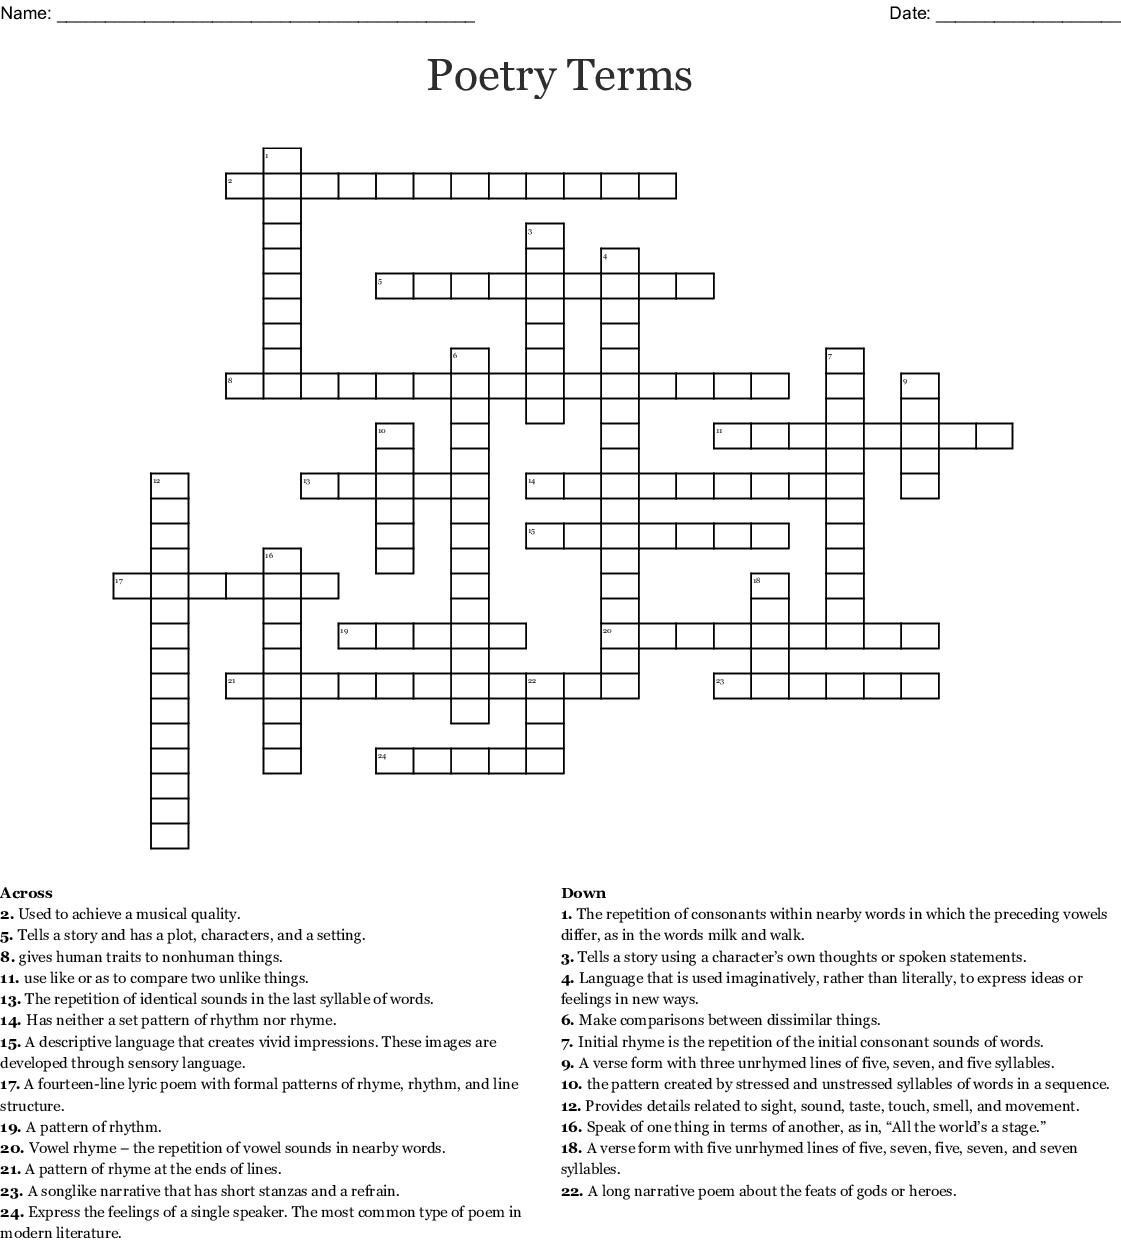 Literary Terms Crossword Puzzle (1-20) - WordMint